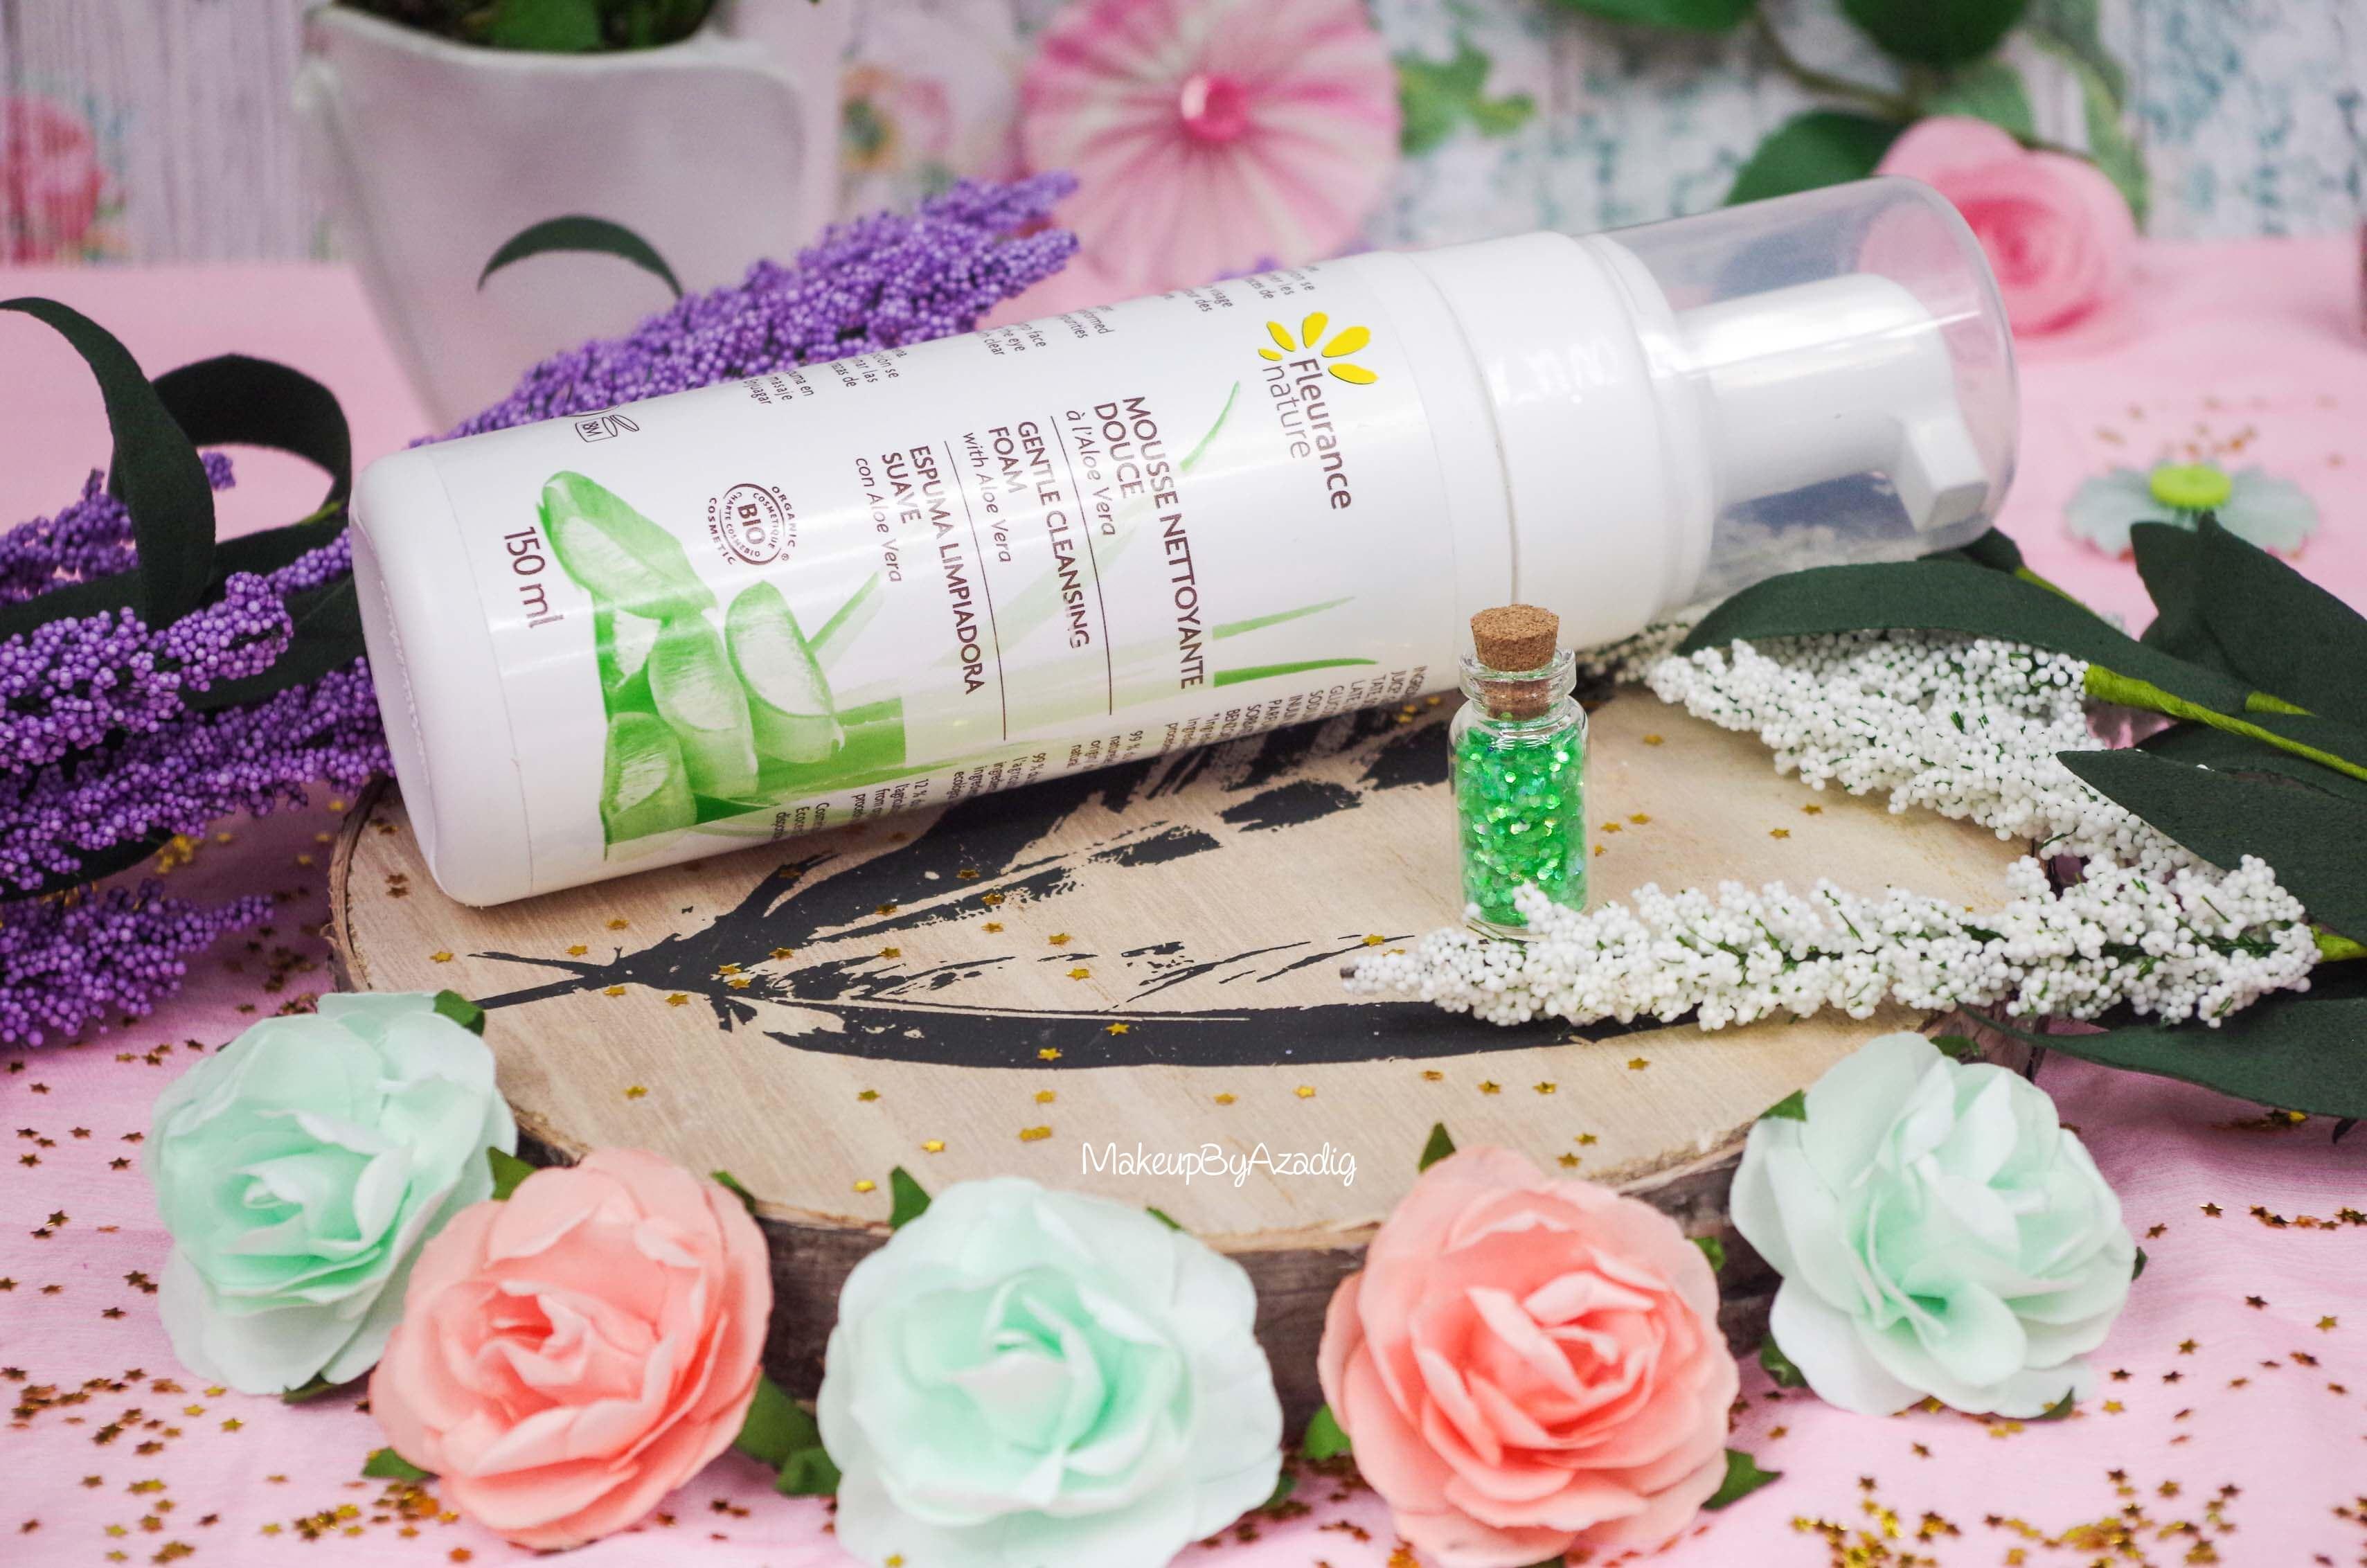 aloe-vera-revue-review-mousse-nettoyante-douce-fleurance-nature-partenariat-soin-bio-makeupbyazadig-avis-prix-influencer